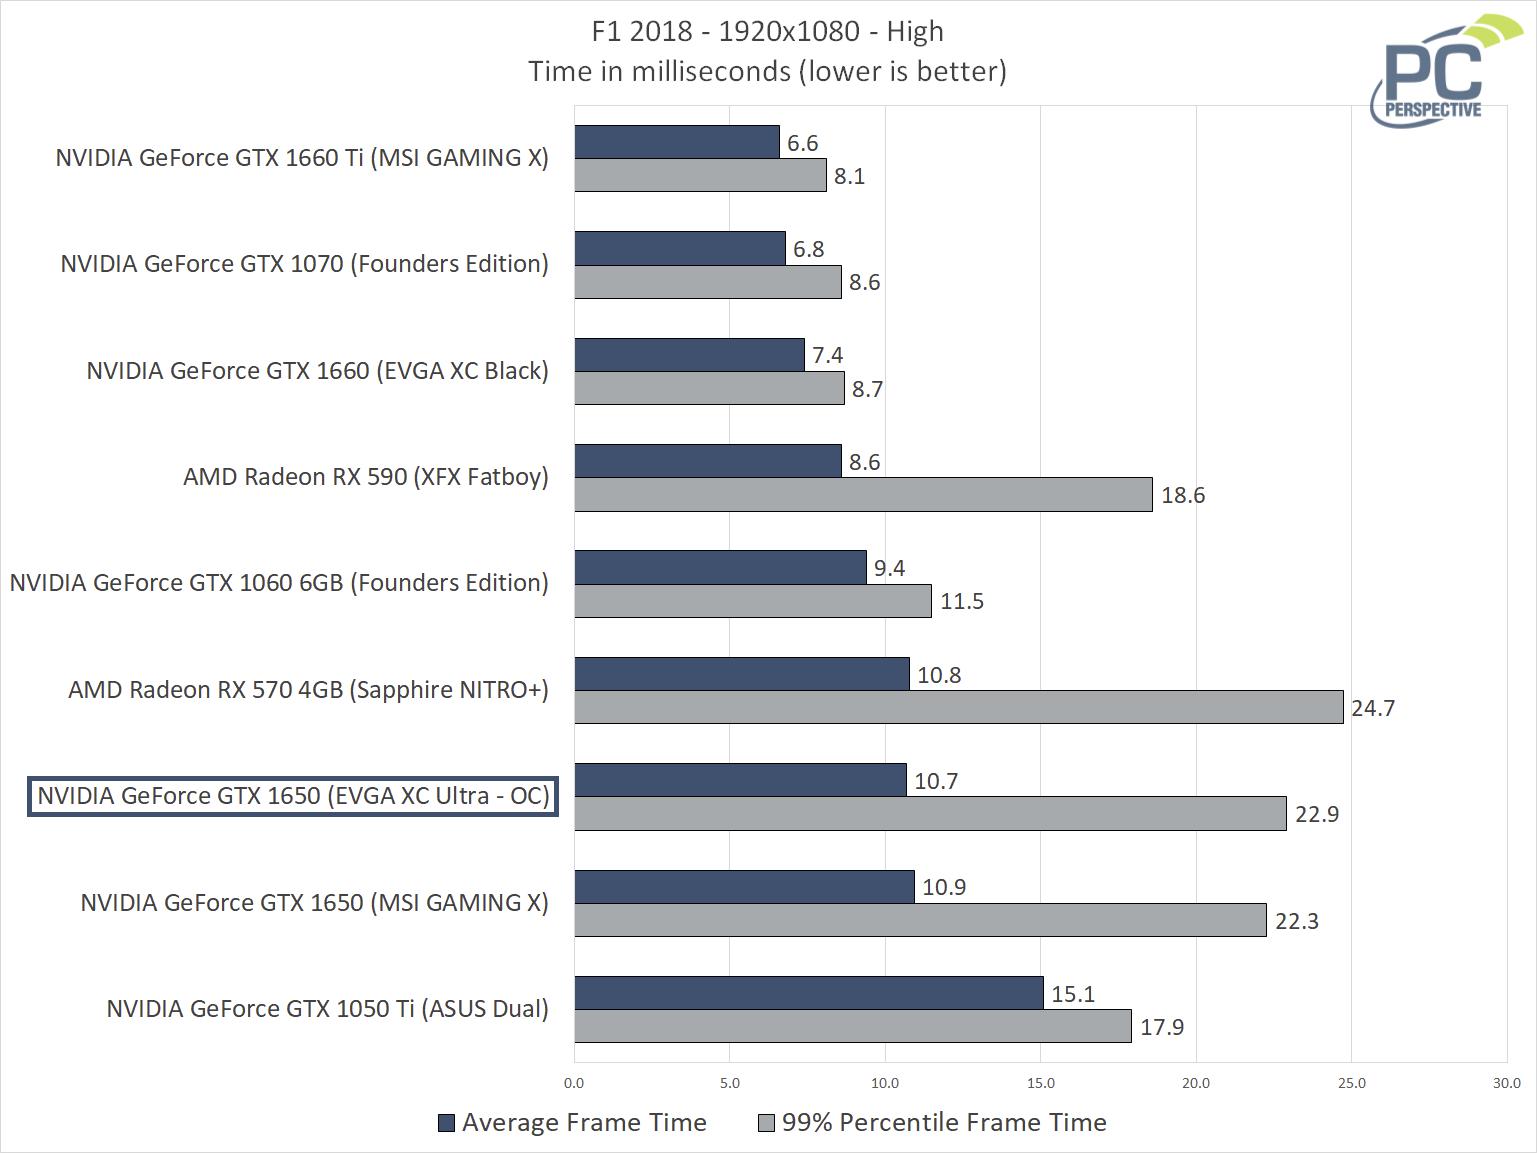 EVGA GTX 1650 SC ULTRA F1 2018 Frametimes